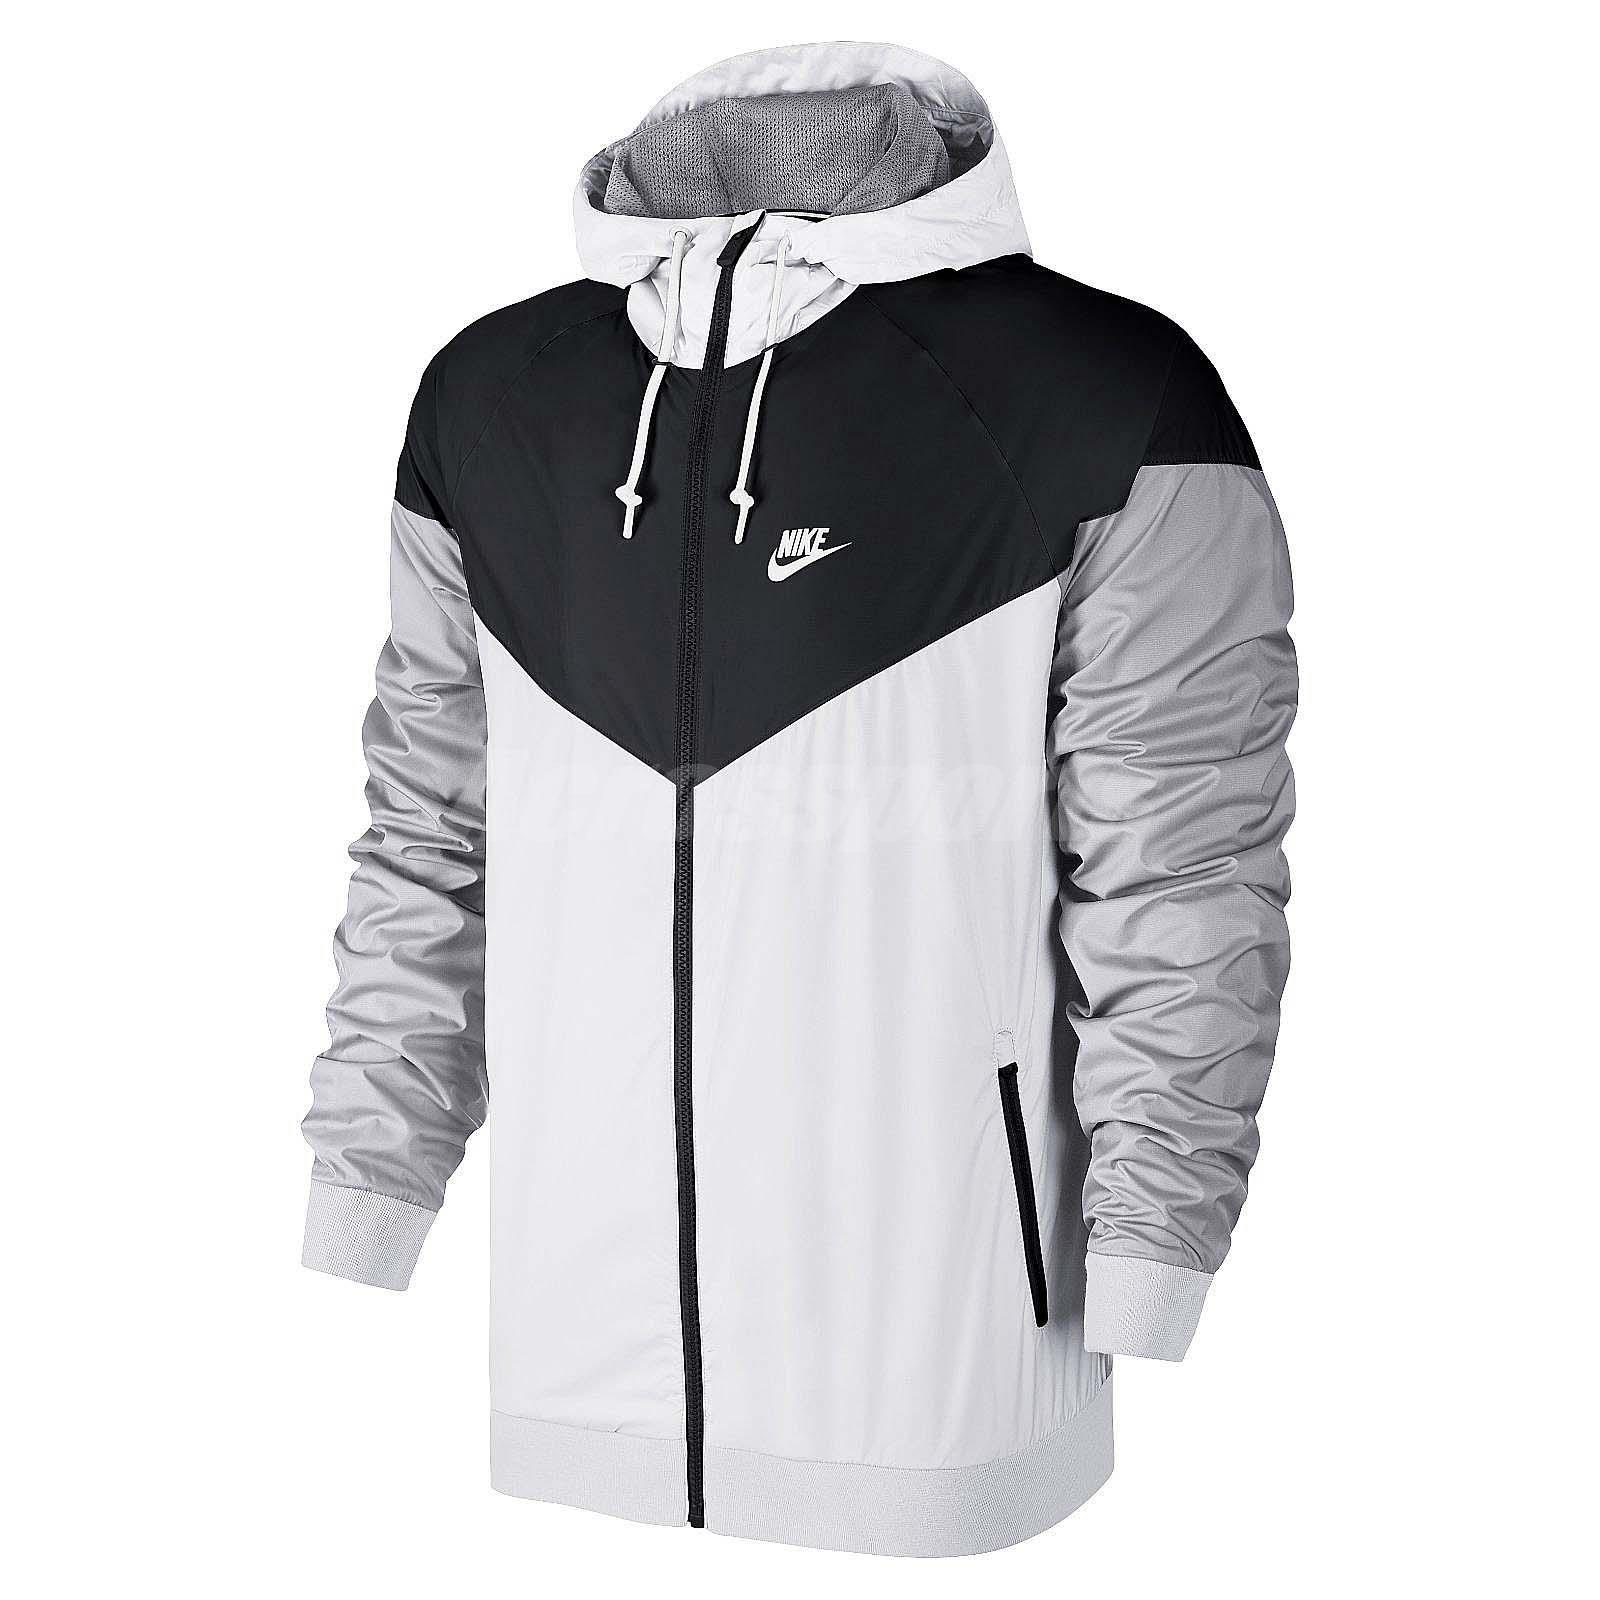 Asian size nike as windrunner black white grey mens nsw jacket hoodie 727325 101